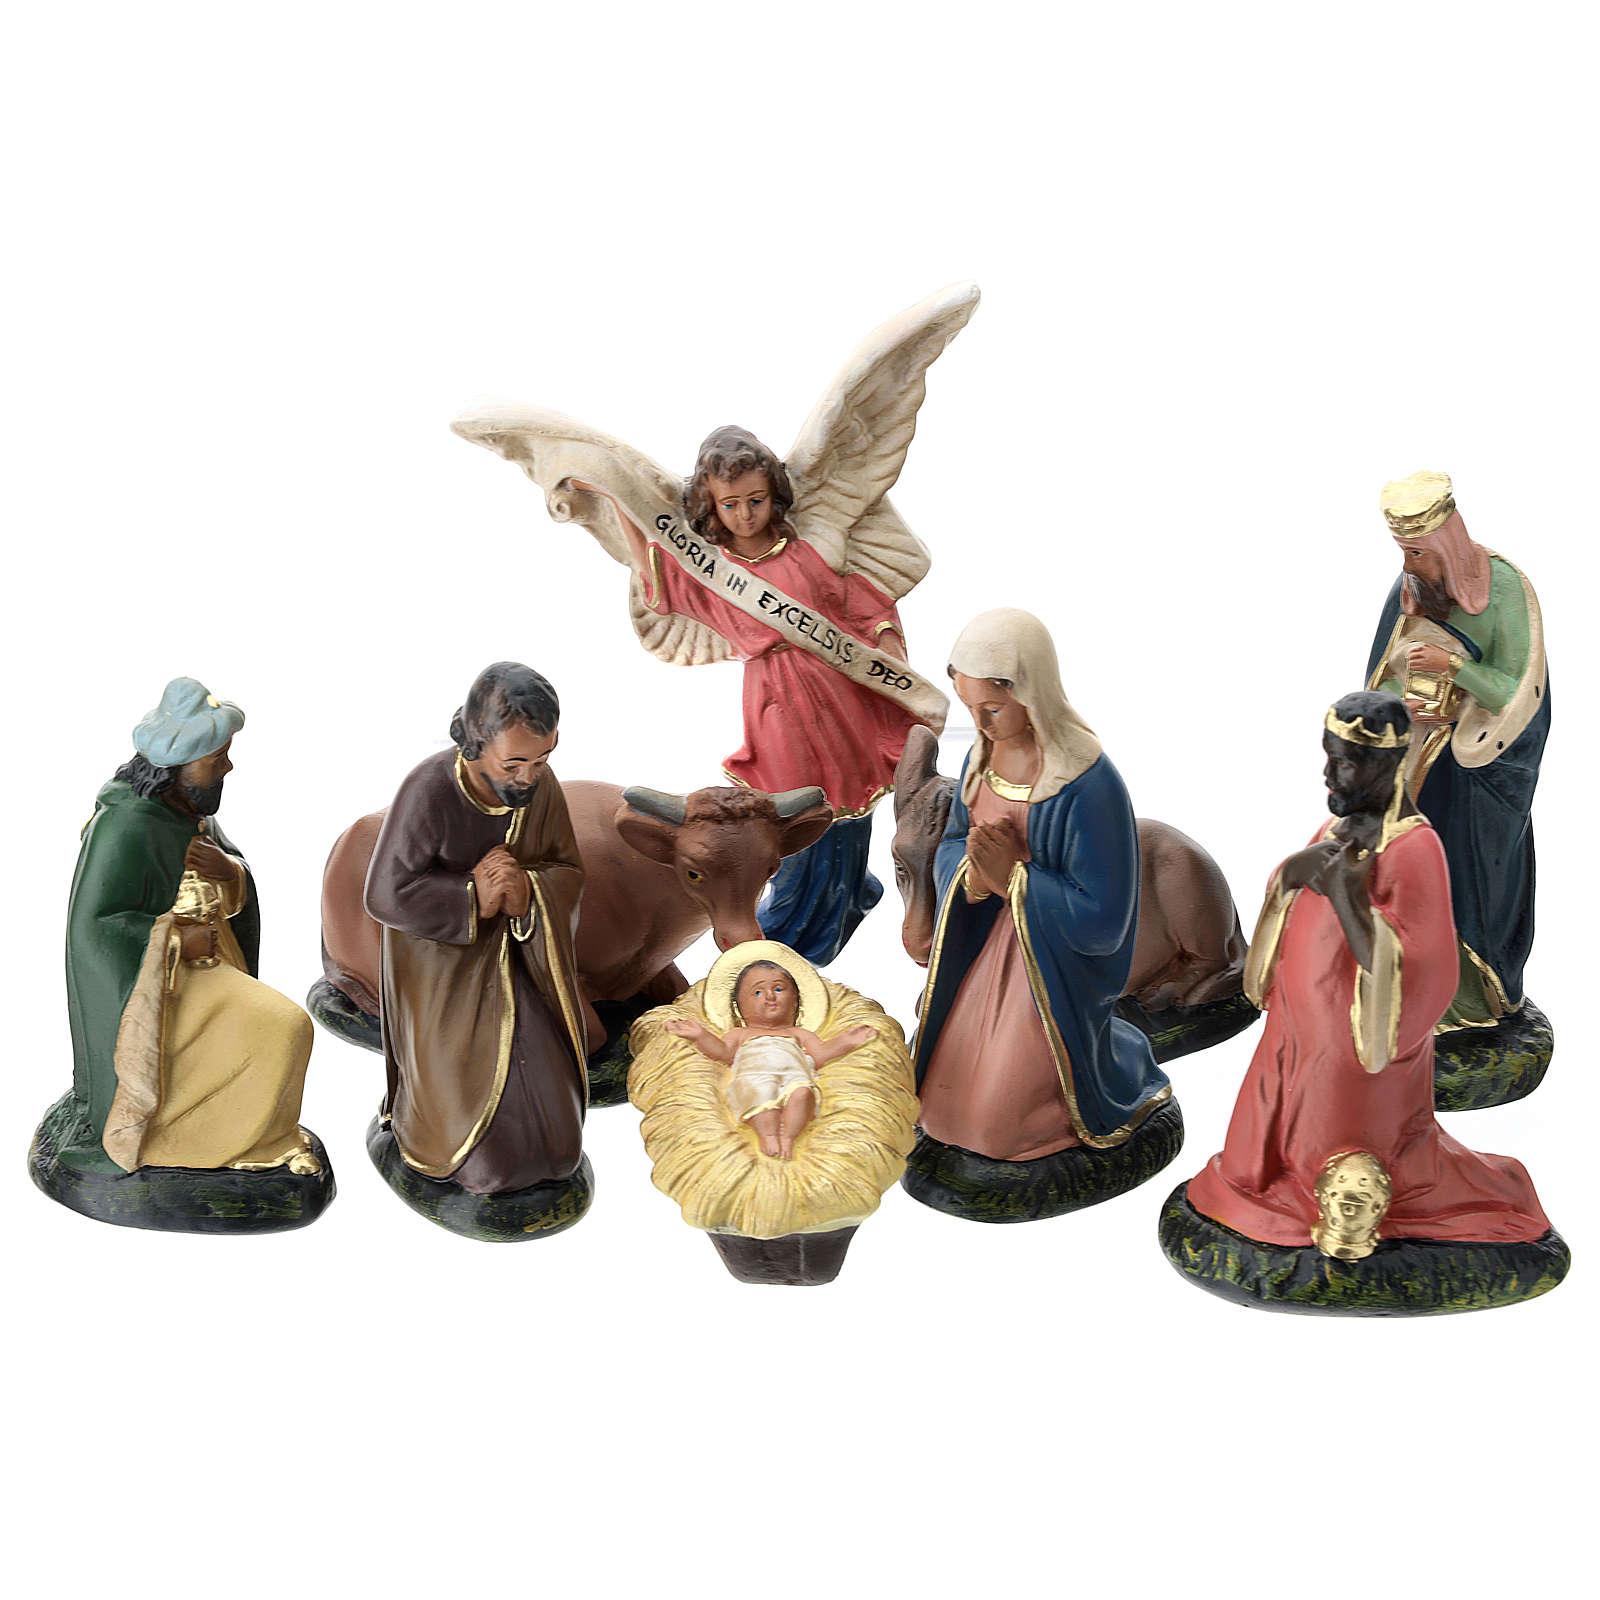 Set Arte Barsanti presepe 9 personaggi 15 cm 4